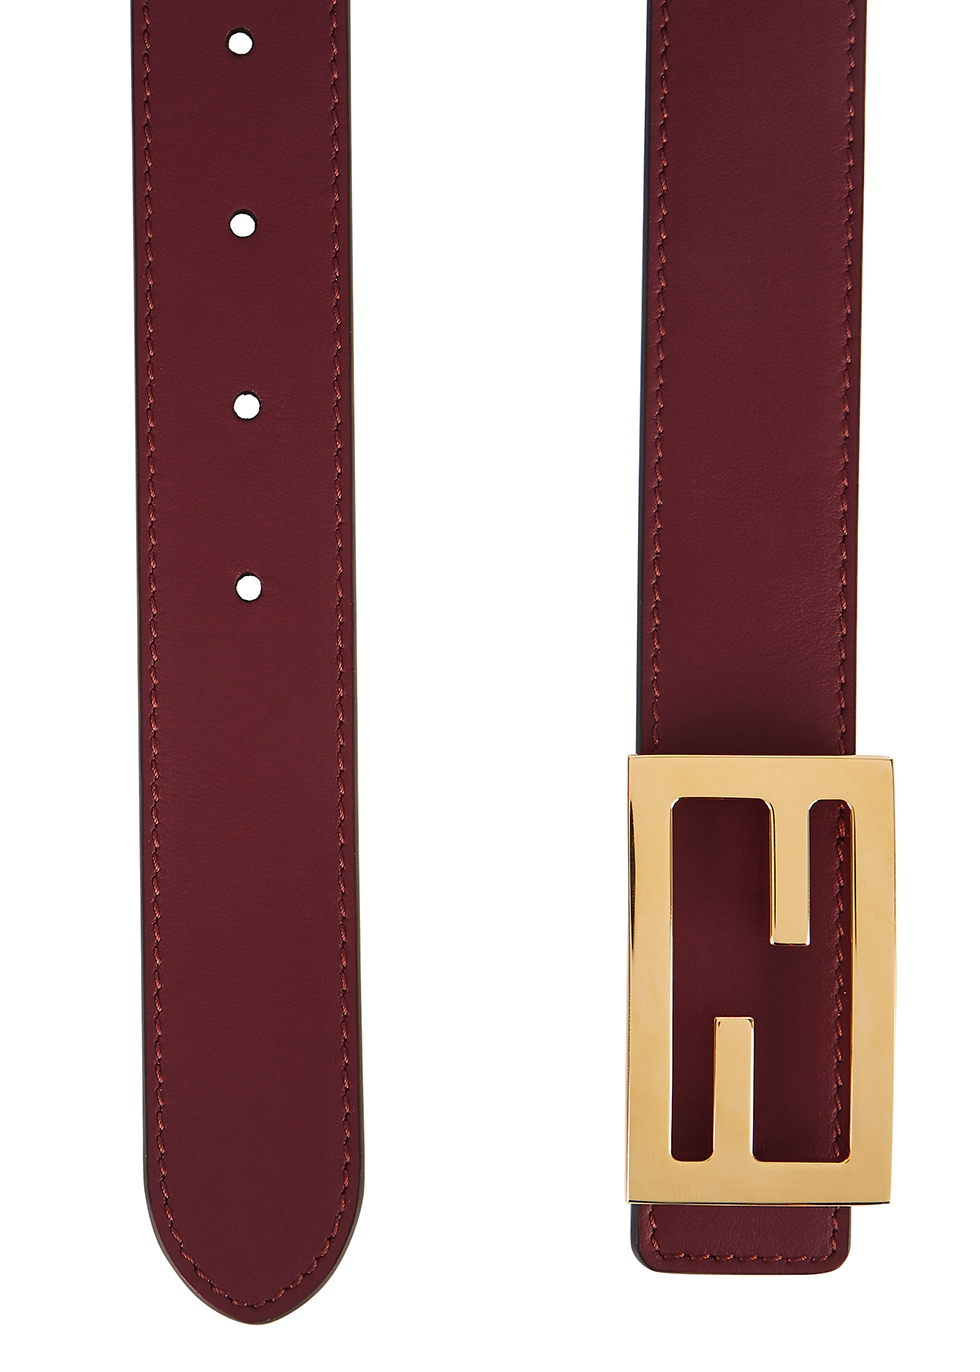 Fendi Burgundy reversible leather belt Harvey Nichols